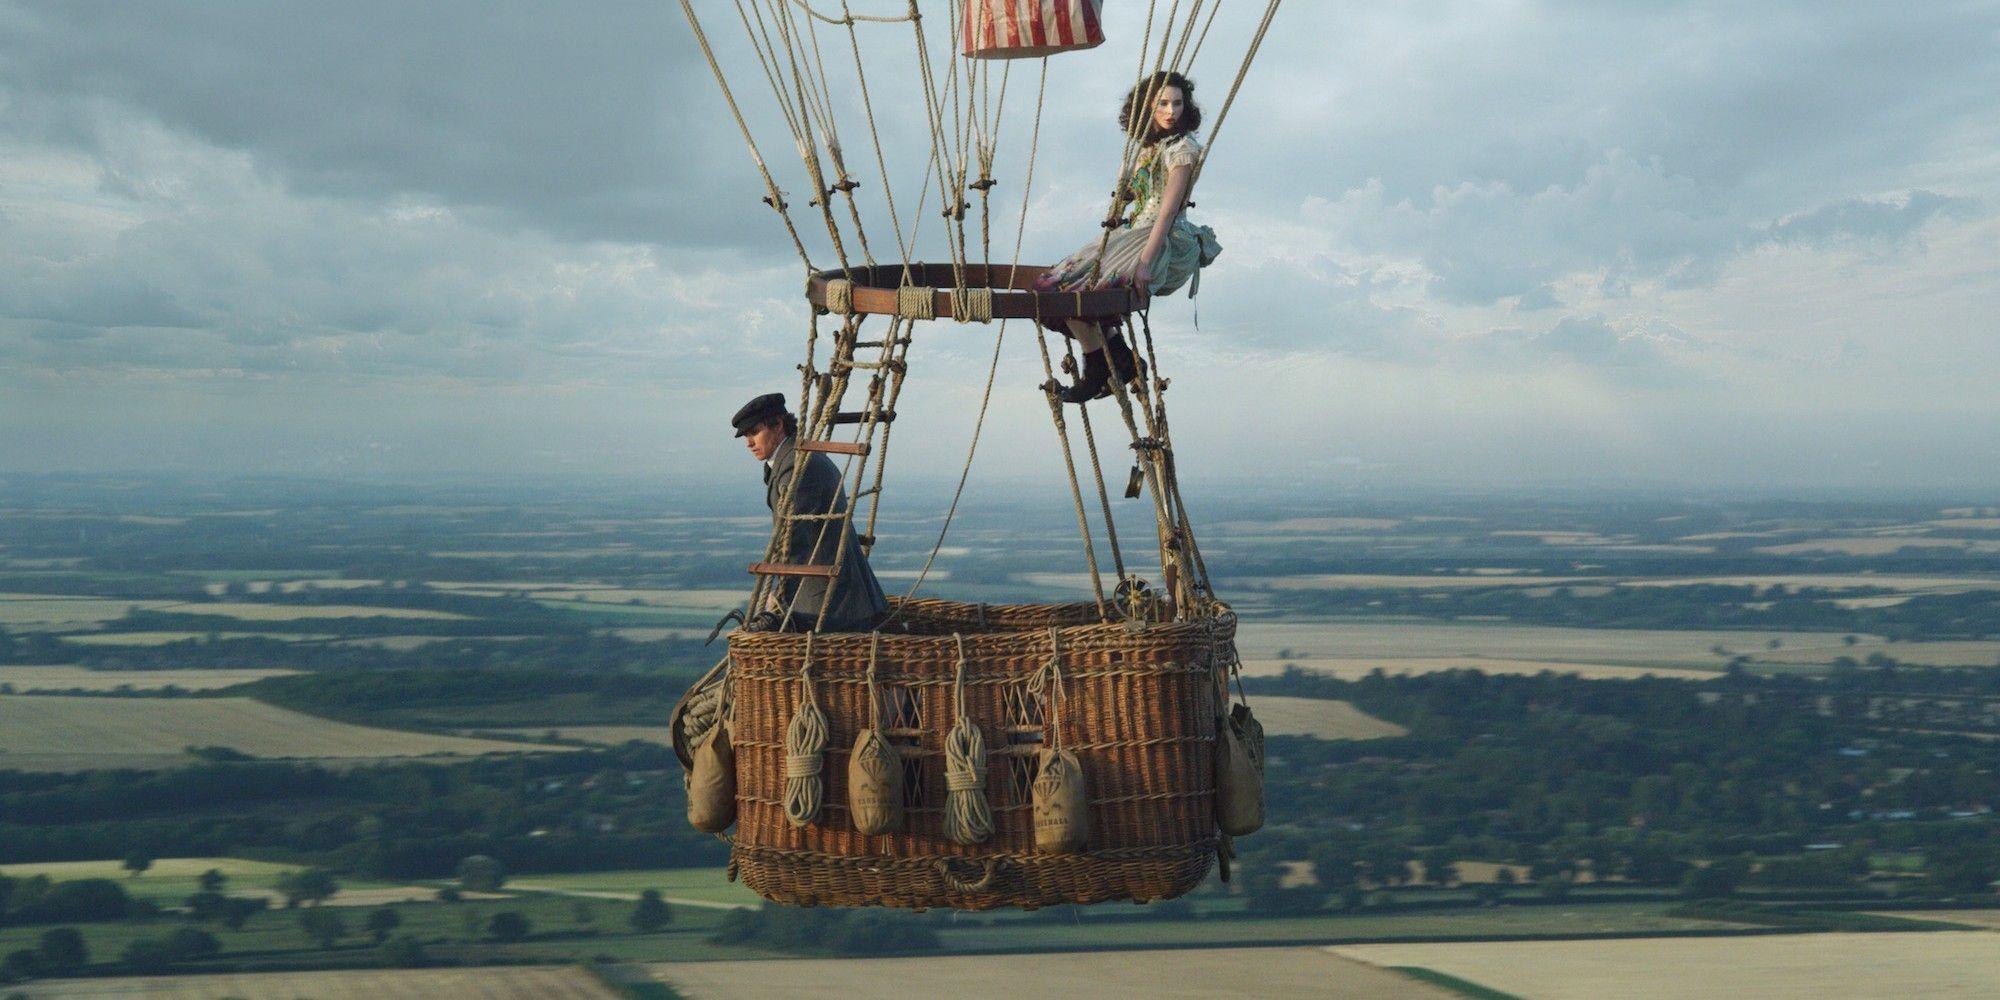 Aeronauts Film Trailer: Redmayne & Jones Are In a Hot Air Balloon